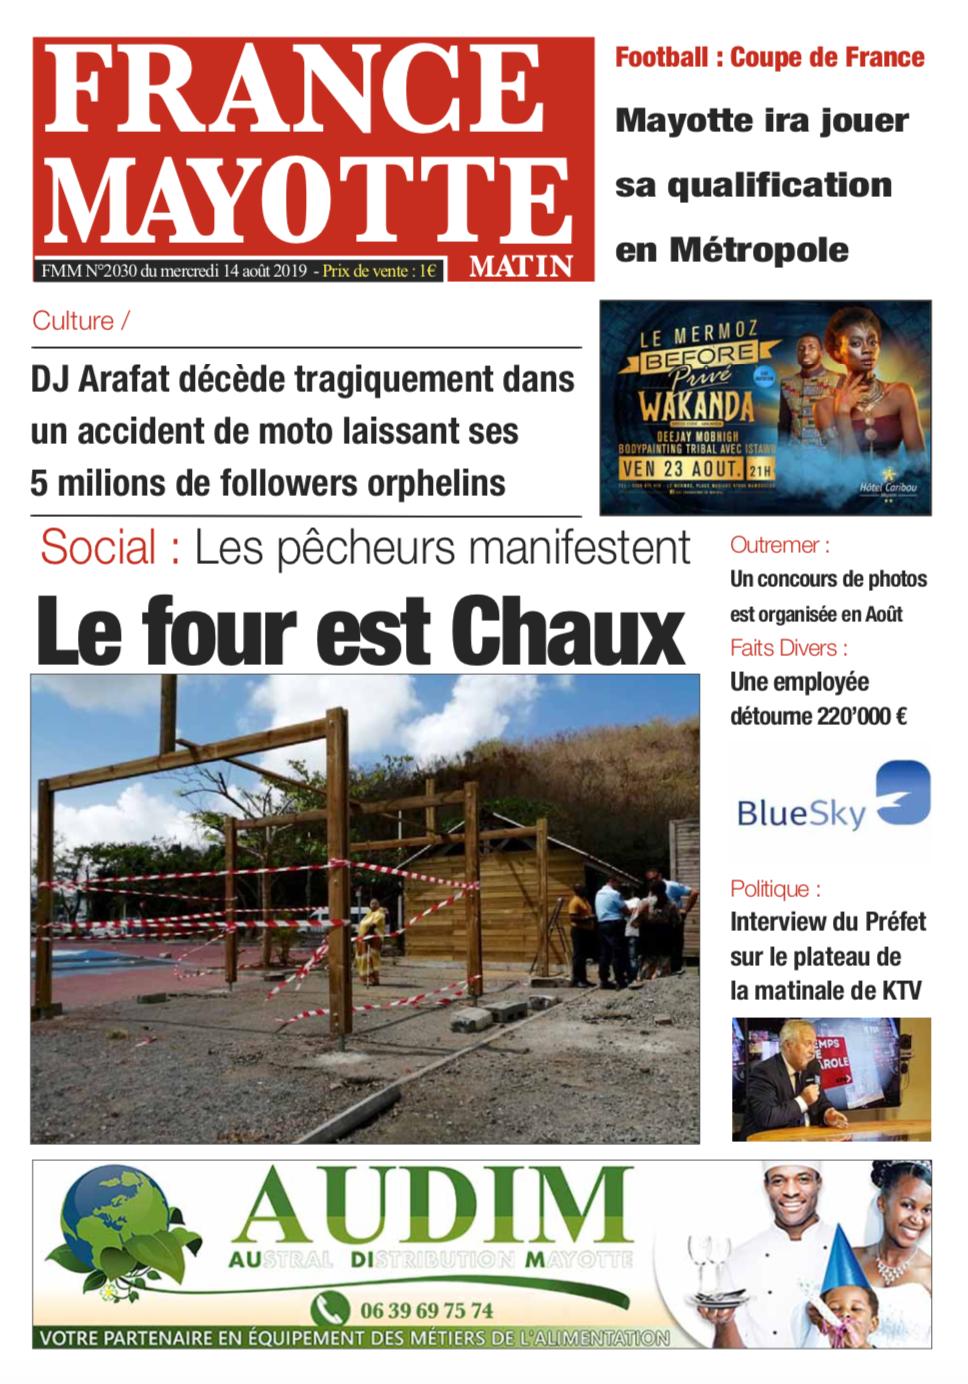 France Mayotte Mercredi 14 août 2019